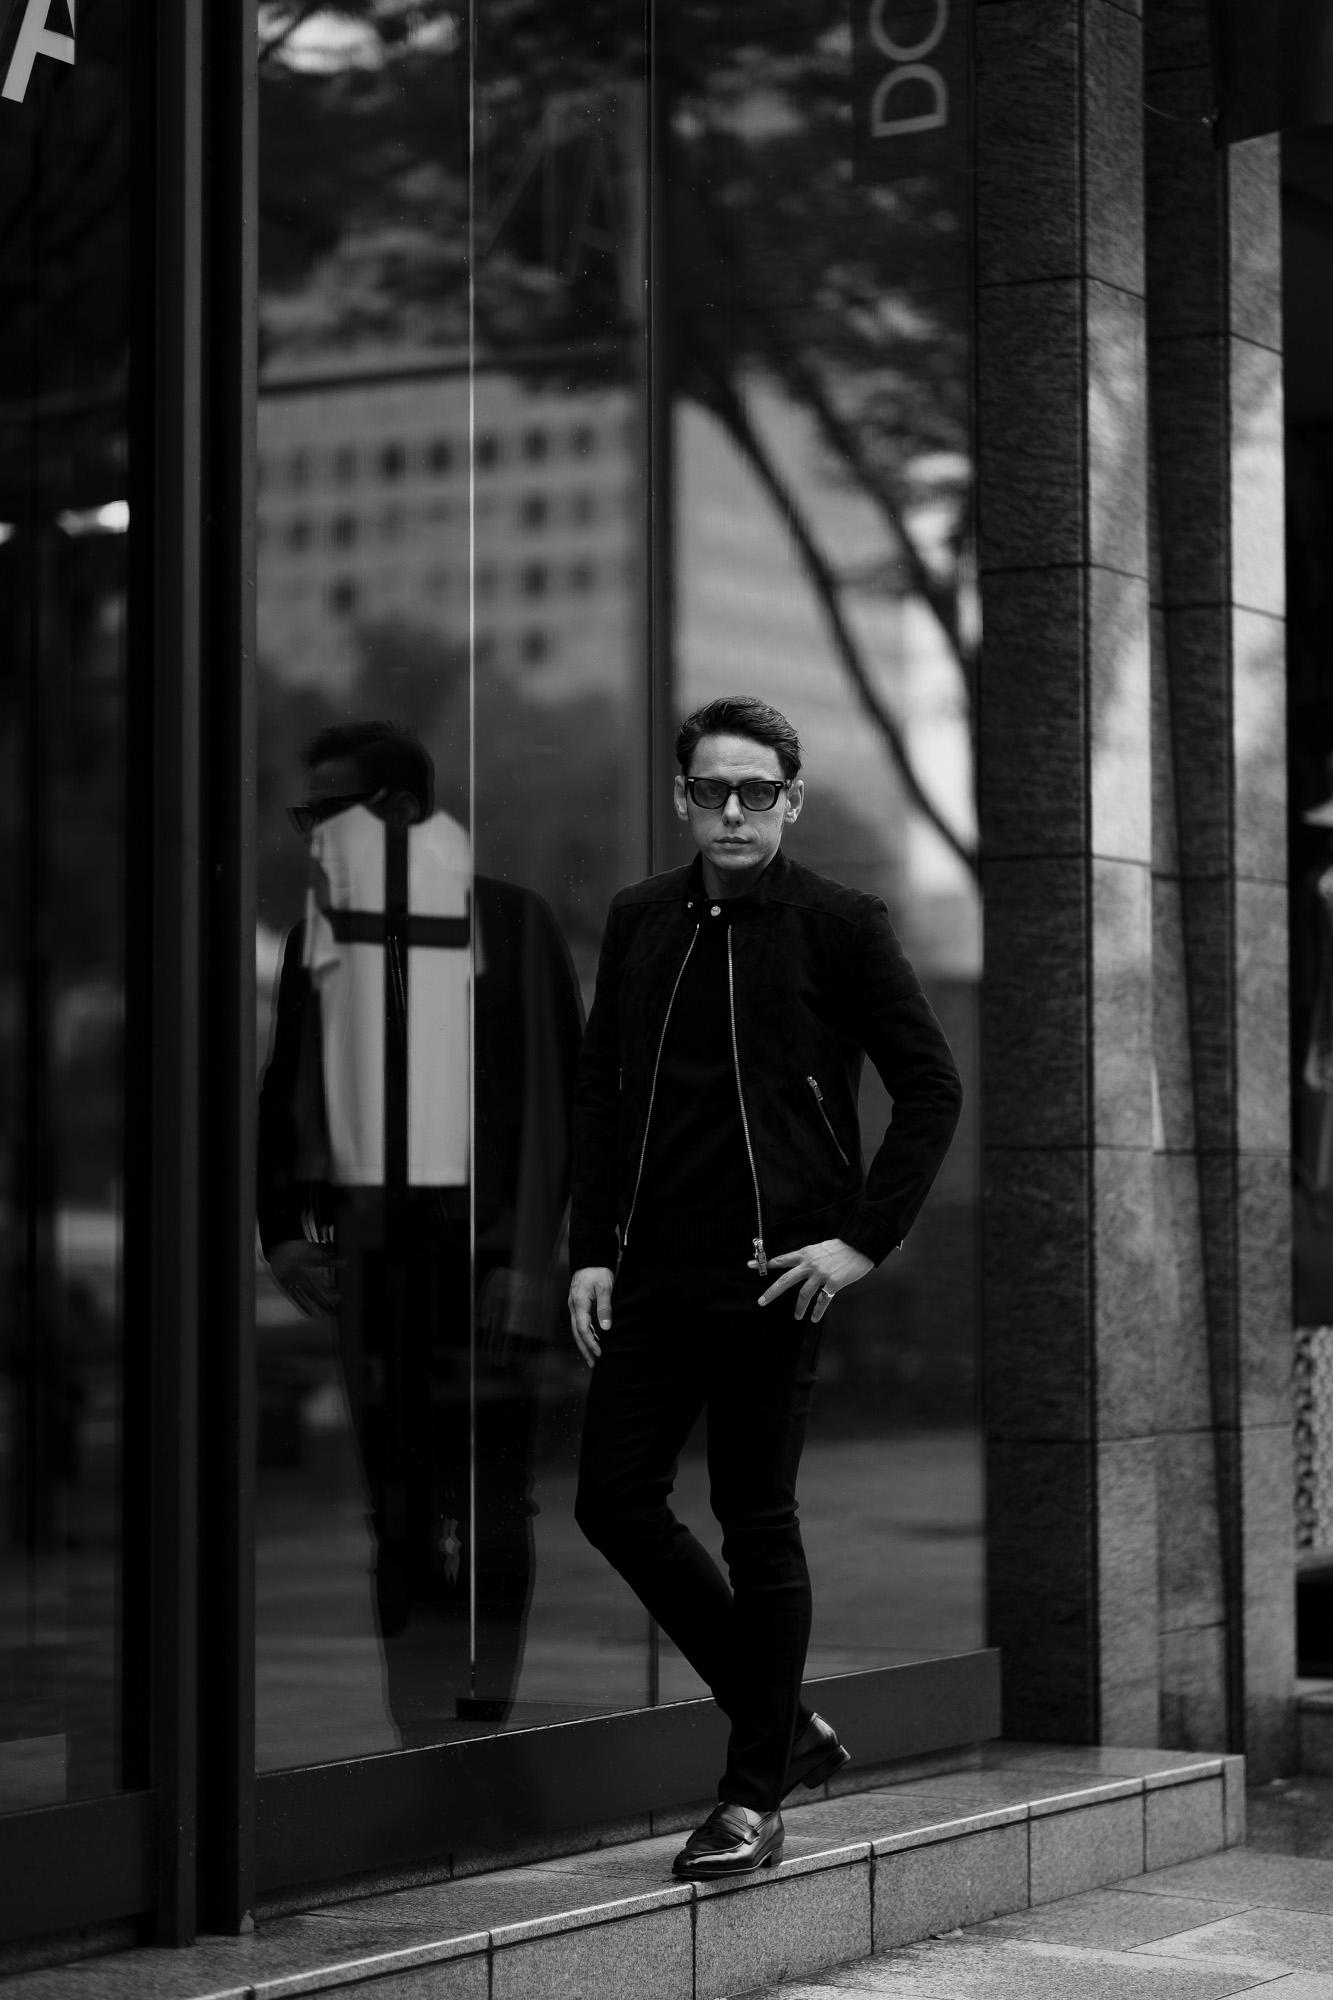 FIXER(フィクサー) F2(エフツー) SINGLE RIDERS Cashmere Suede Leather シングルライダース ジャケット BLACK(ブラック) 愛知 名古屋 Alto e Diritto altoediritto アルトエデリット レザージャケット ダブルレザー